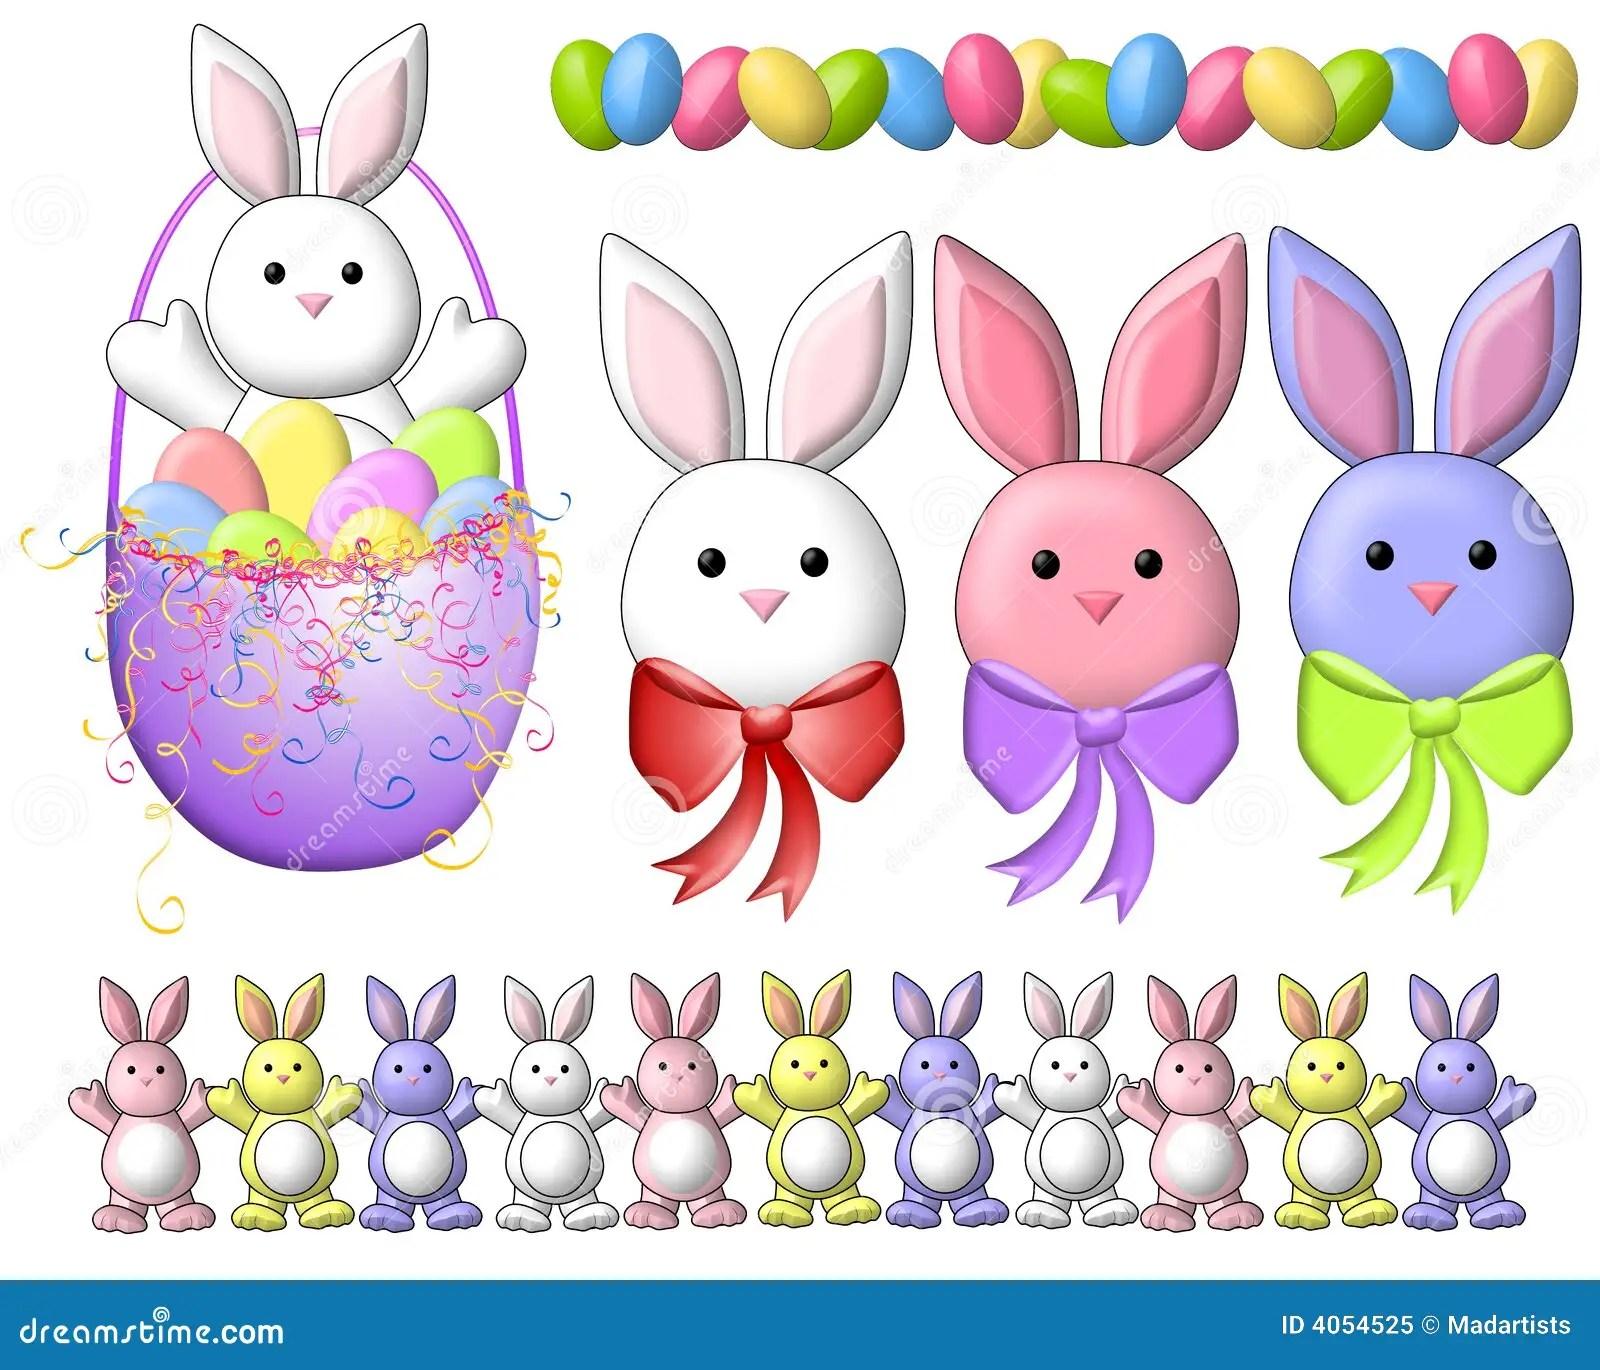 Cute Rabbit Wallpaper Free Download Cartoon Easter Bunnies Clip Art 2 Royalty Free Stock Photo